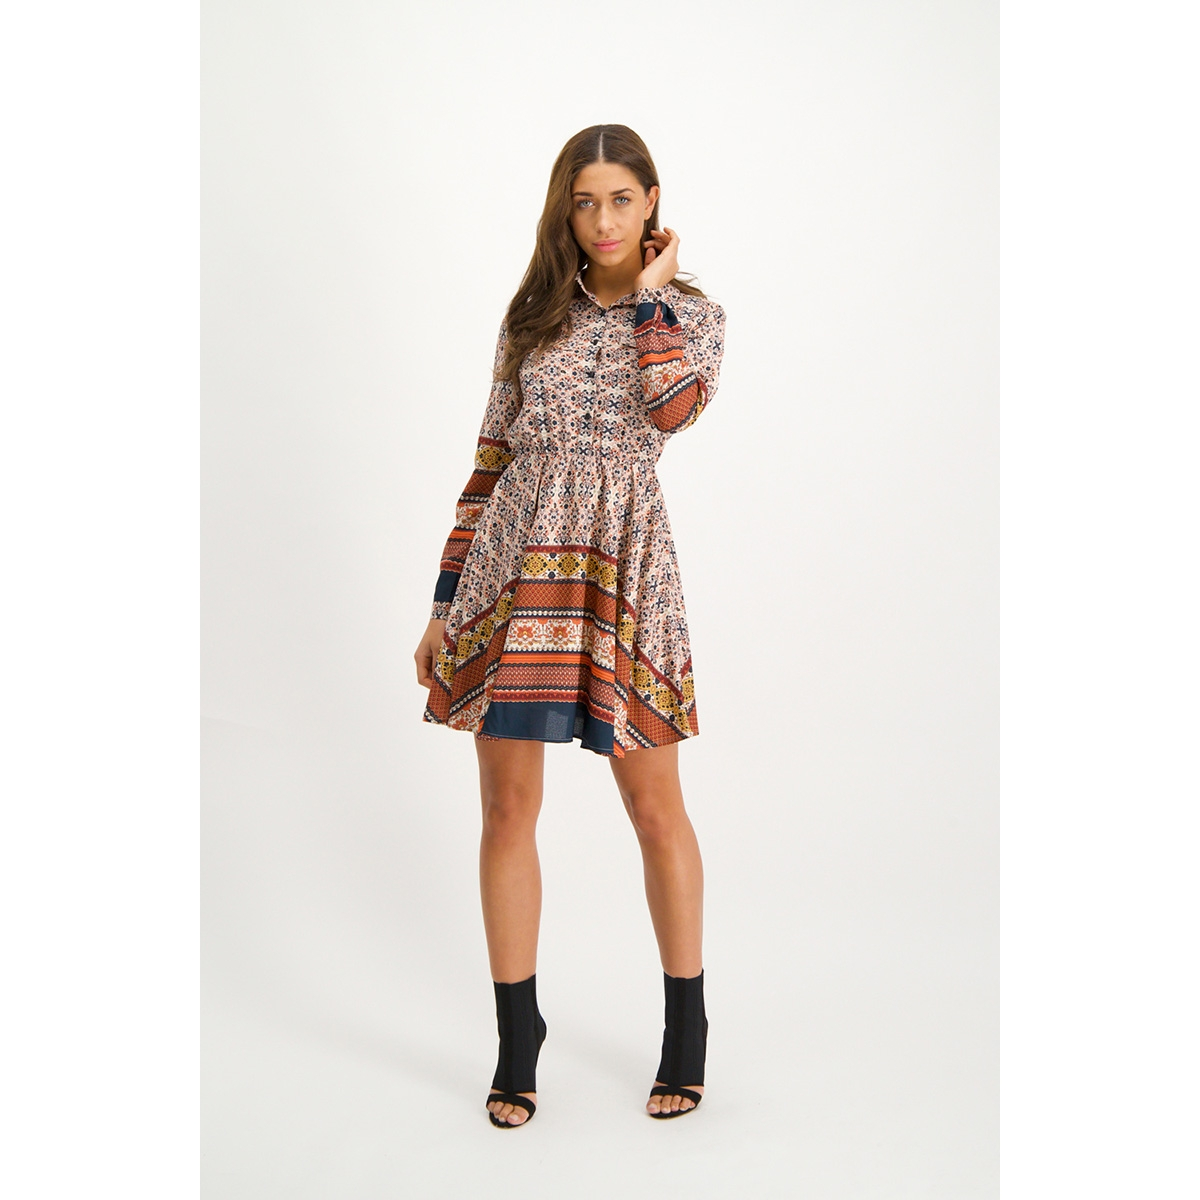 mg13 1 dress jamila lofty manner jurk peach